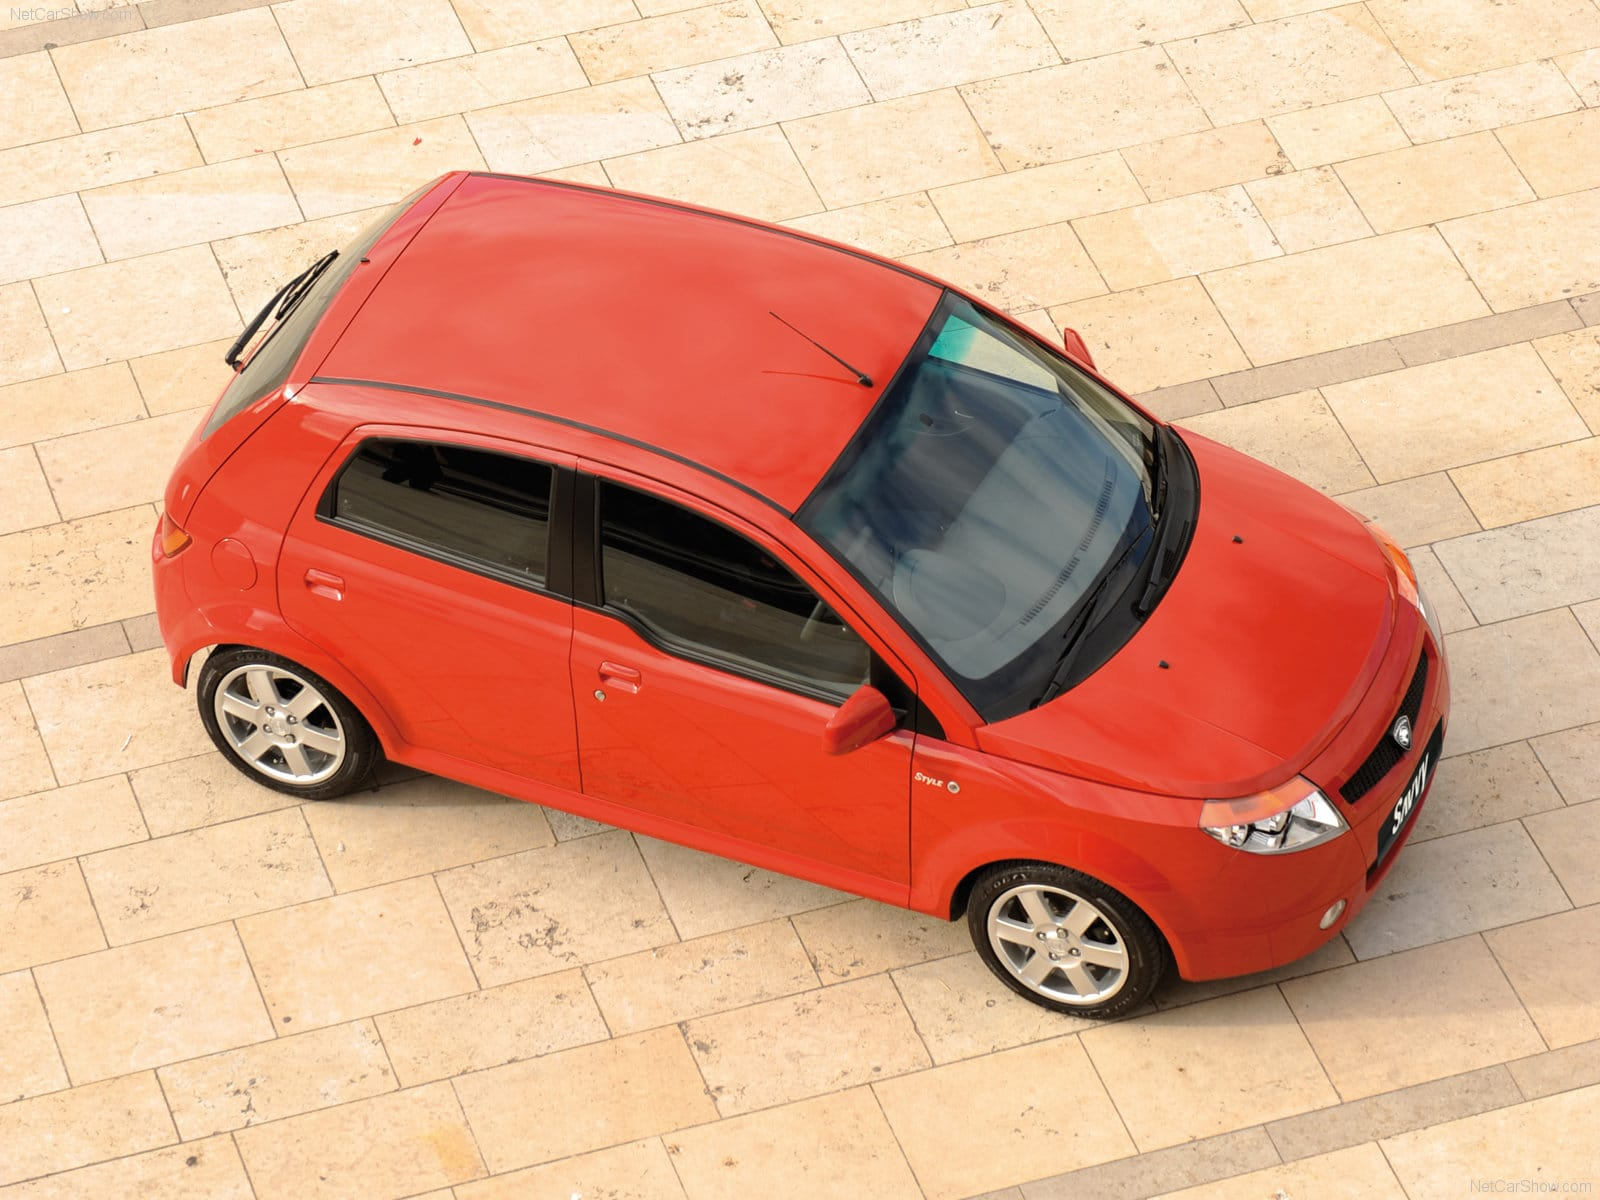 Proton, Proton Savvy, Savvy, car, cheap car, bad car, bargain car, hatchback, car buying, Proton buying guide, motoring, automotive, featured, classic car, retro car, Adrian Flux, www.not2grand.co.uk, motoring, automotive, ebay, ebay motors, autotrader